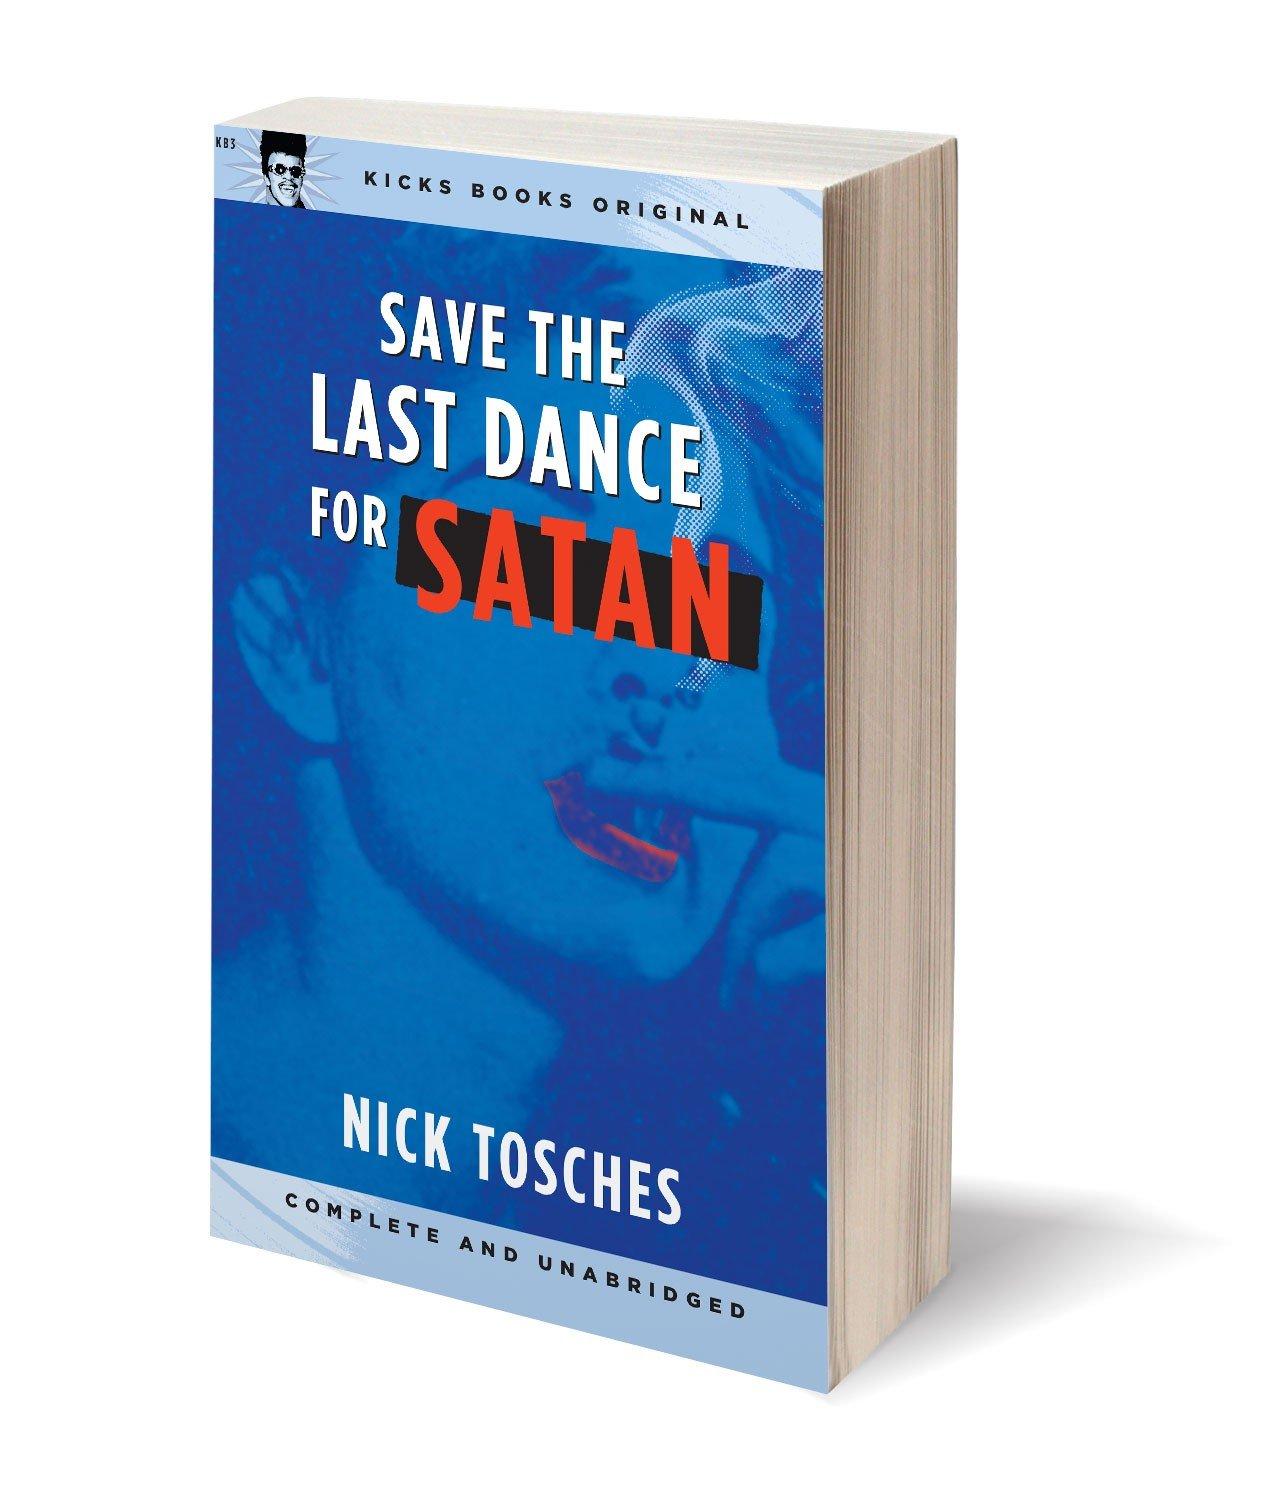 Save the Last Dance for Satan